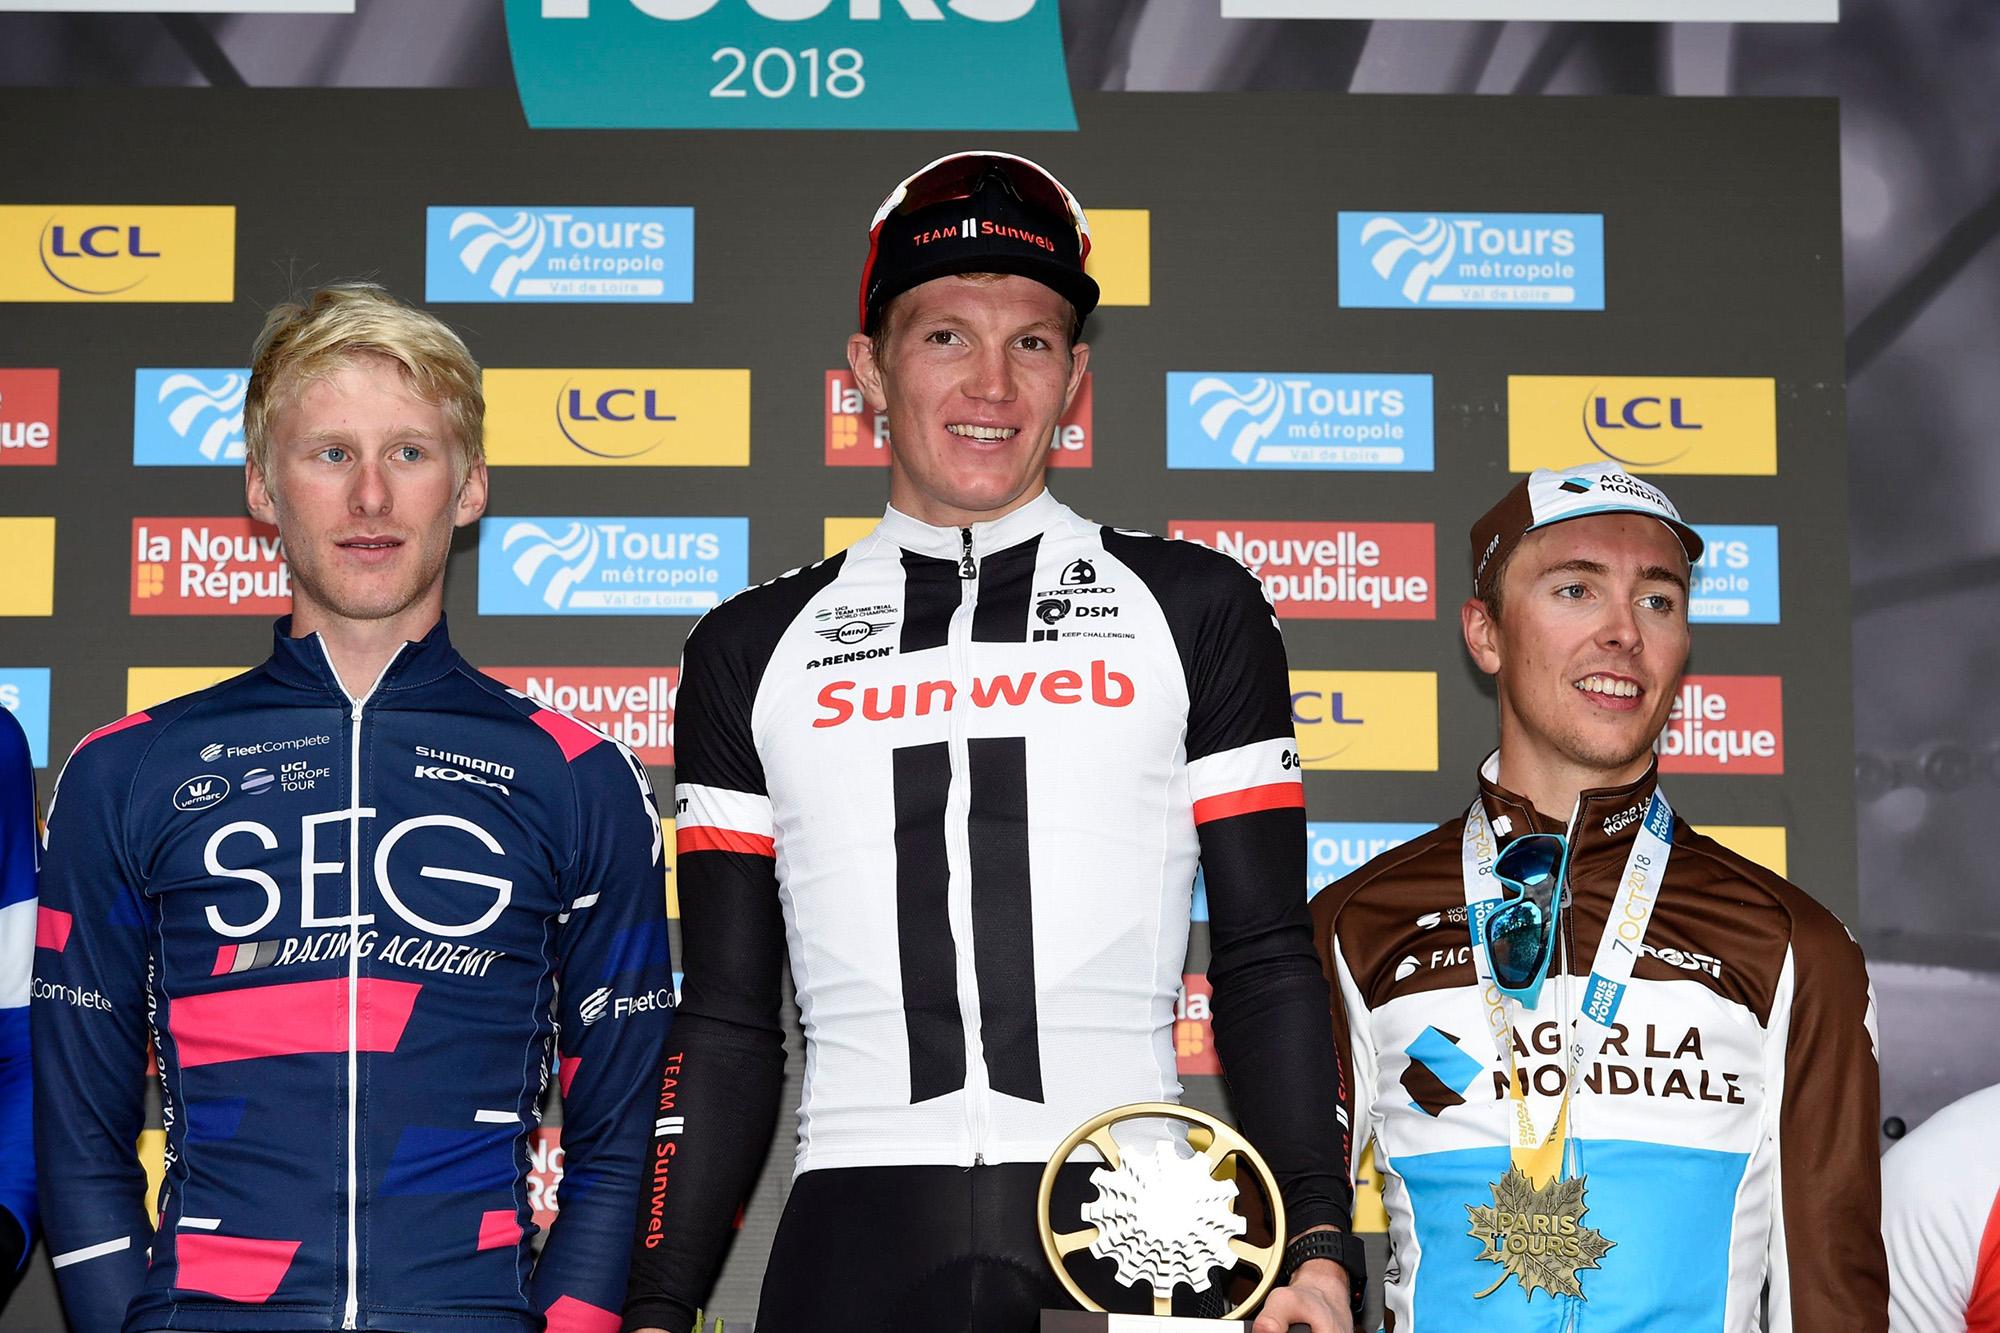 Marten Kooistra Team Sunweb 2019